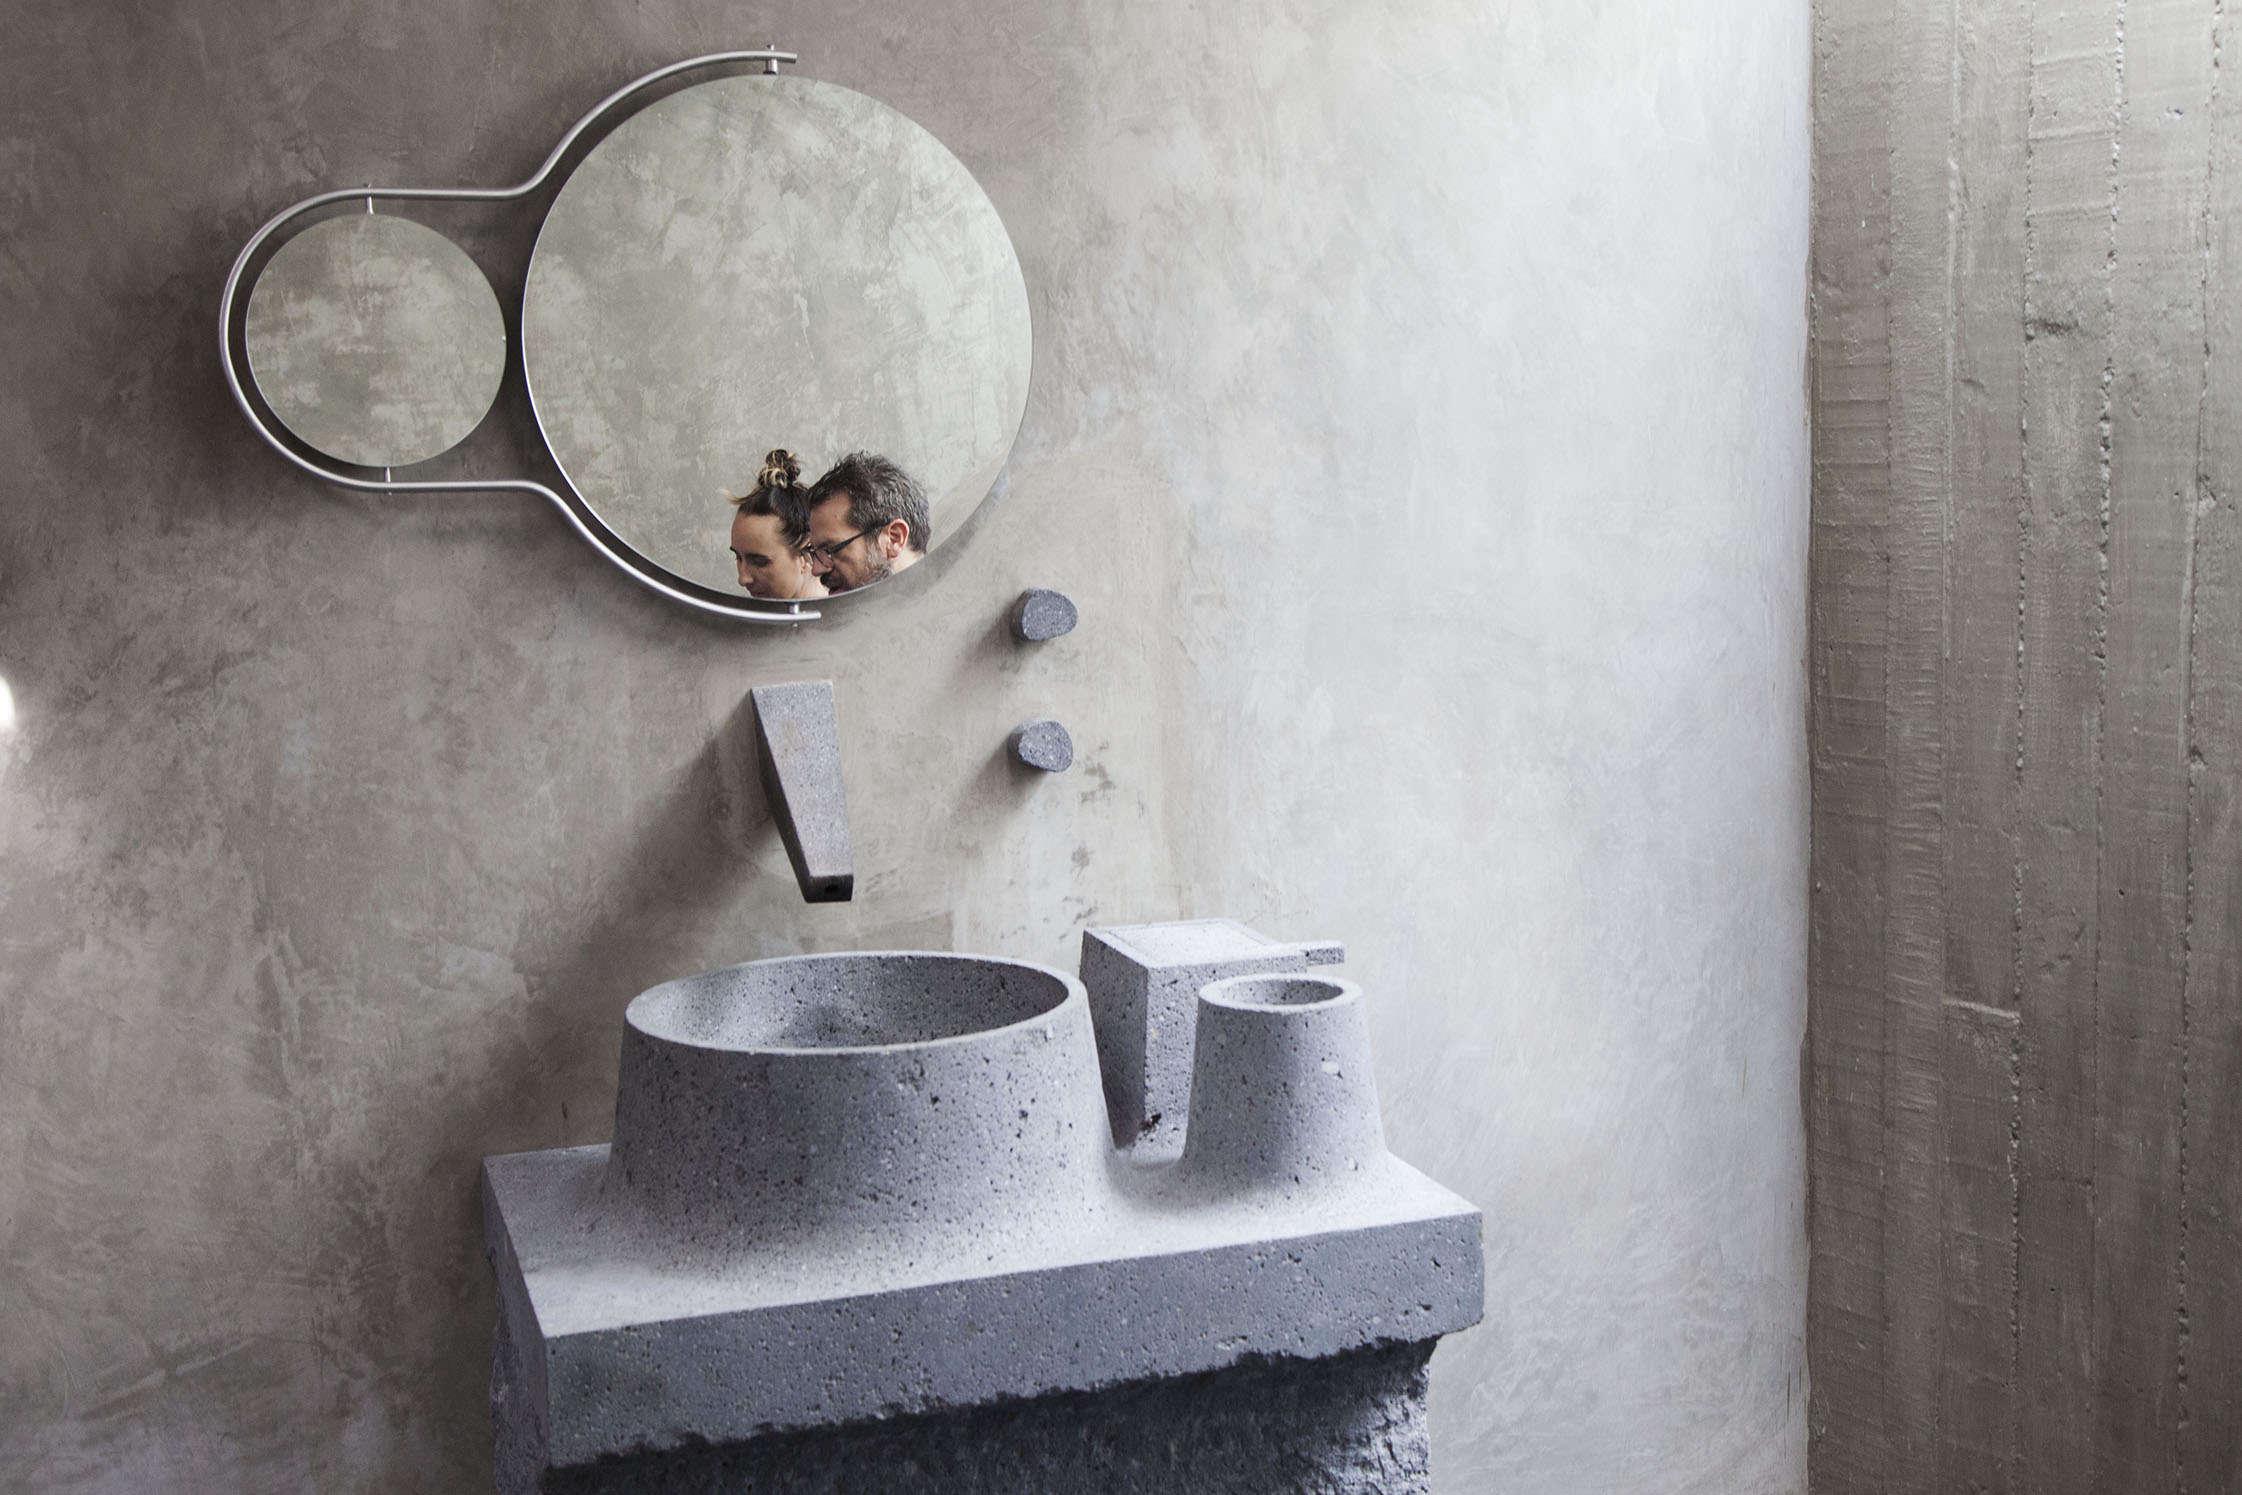 Caste concrete bathroom sink in Pedro Reyes and Carla Fernandez's Brutalist house in Mexico City via FvF | Remodelista